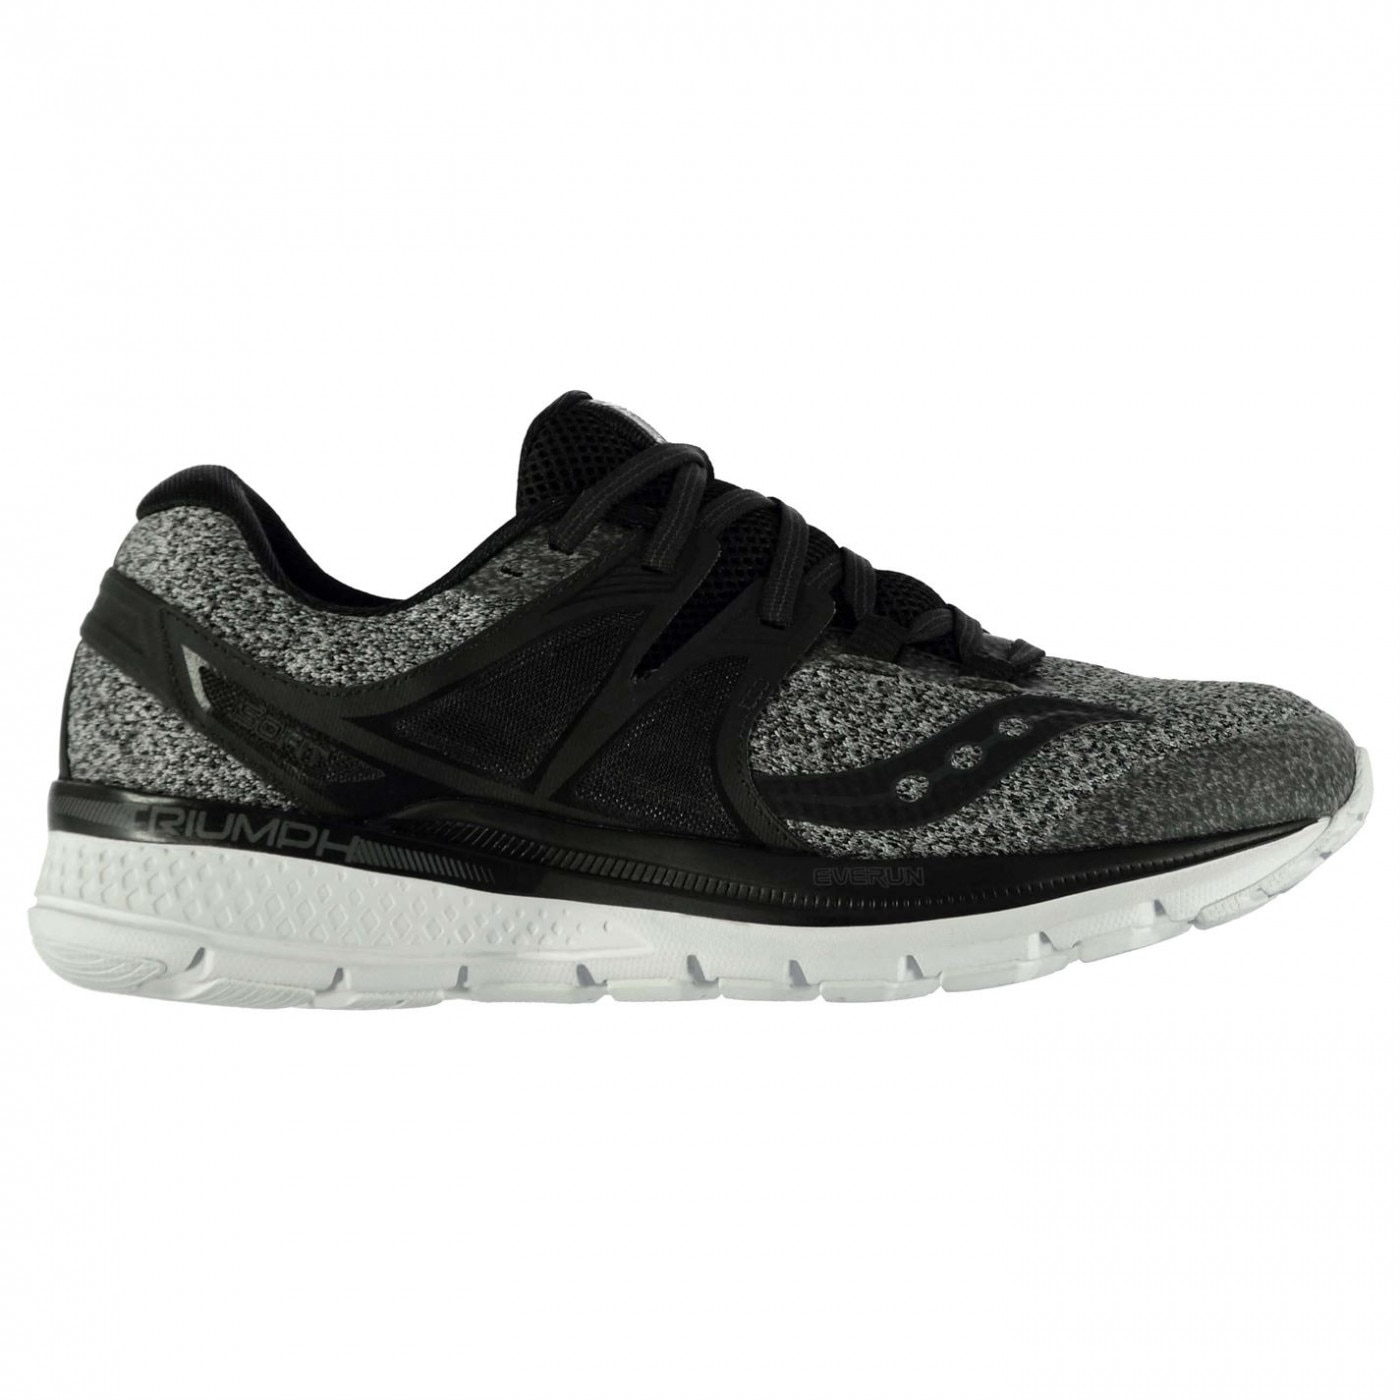 Saucony Triumph LOTR Ladies Running Shoes